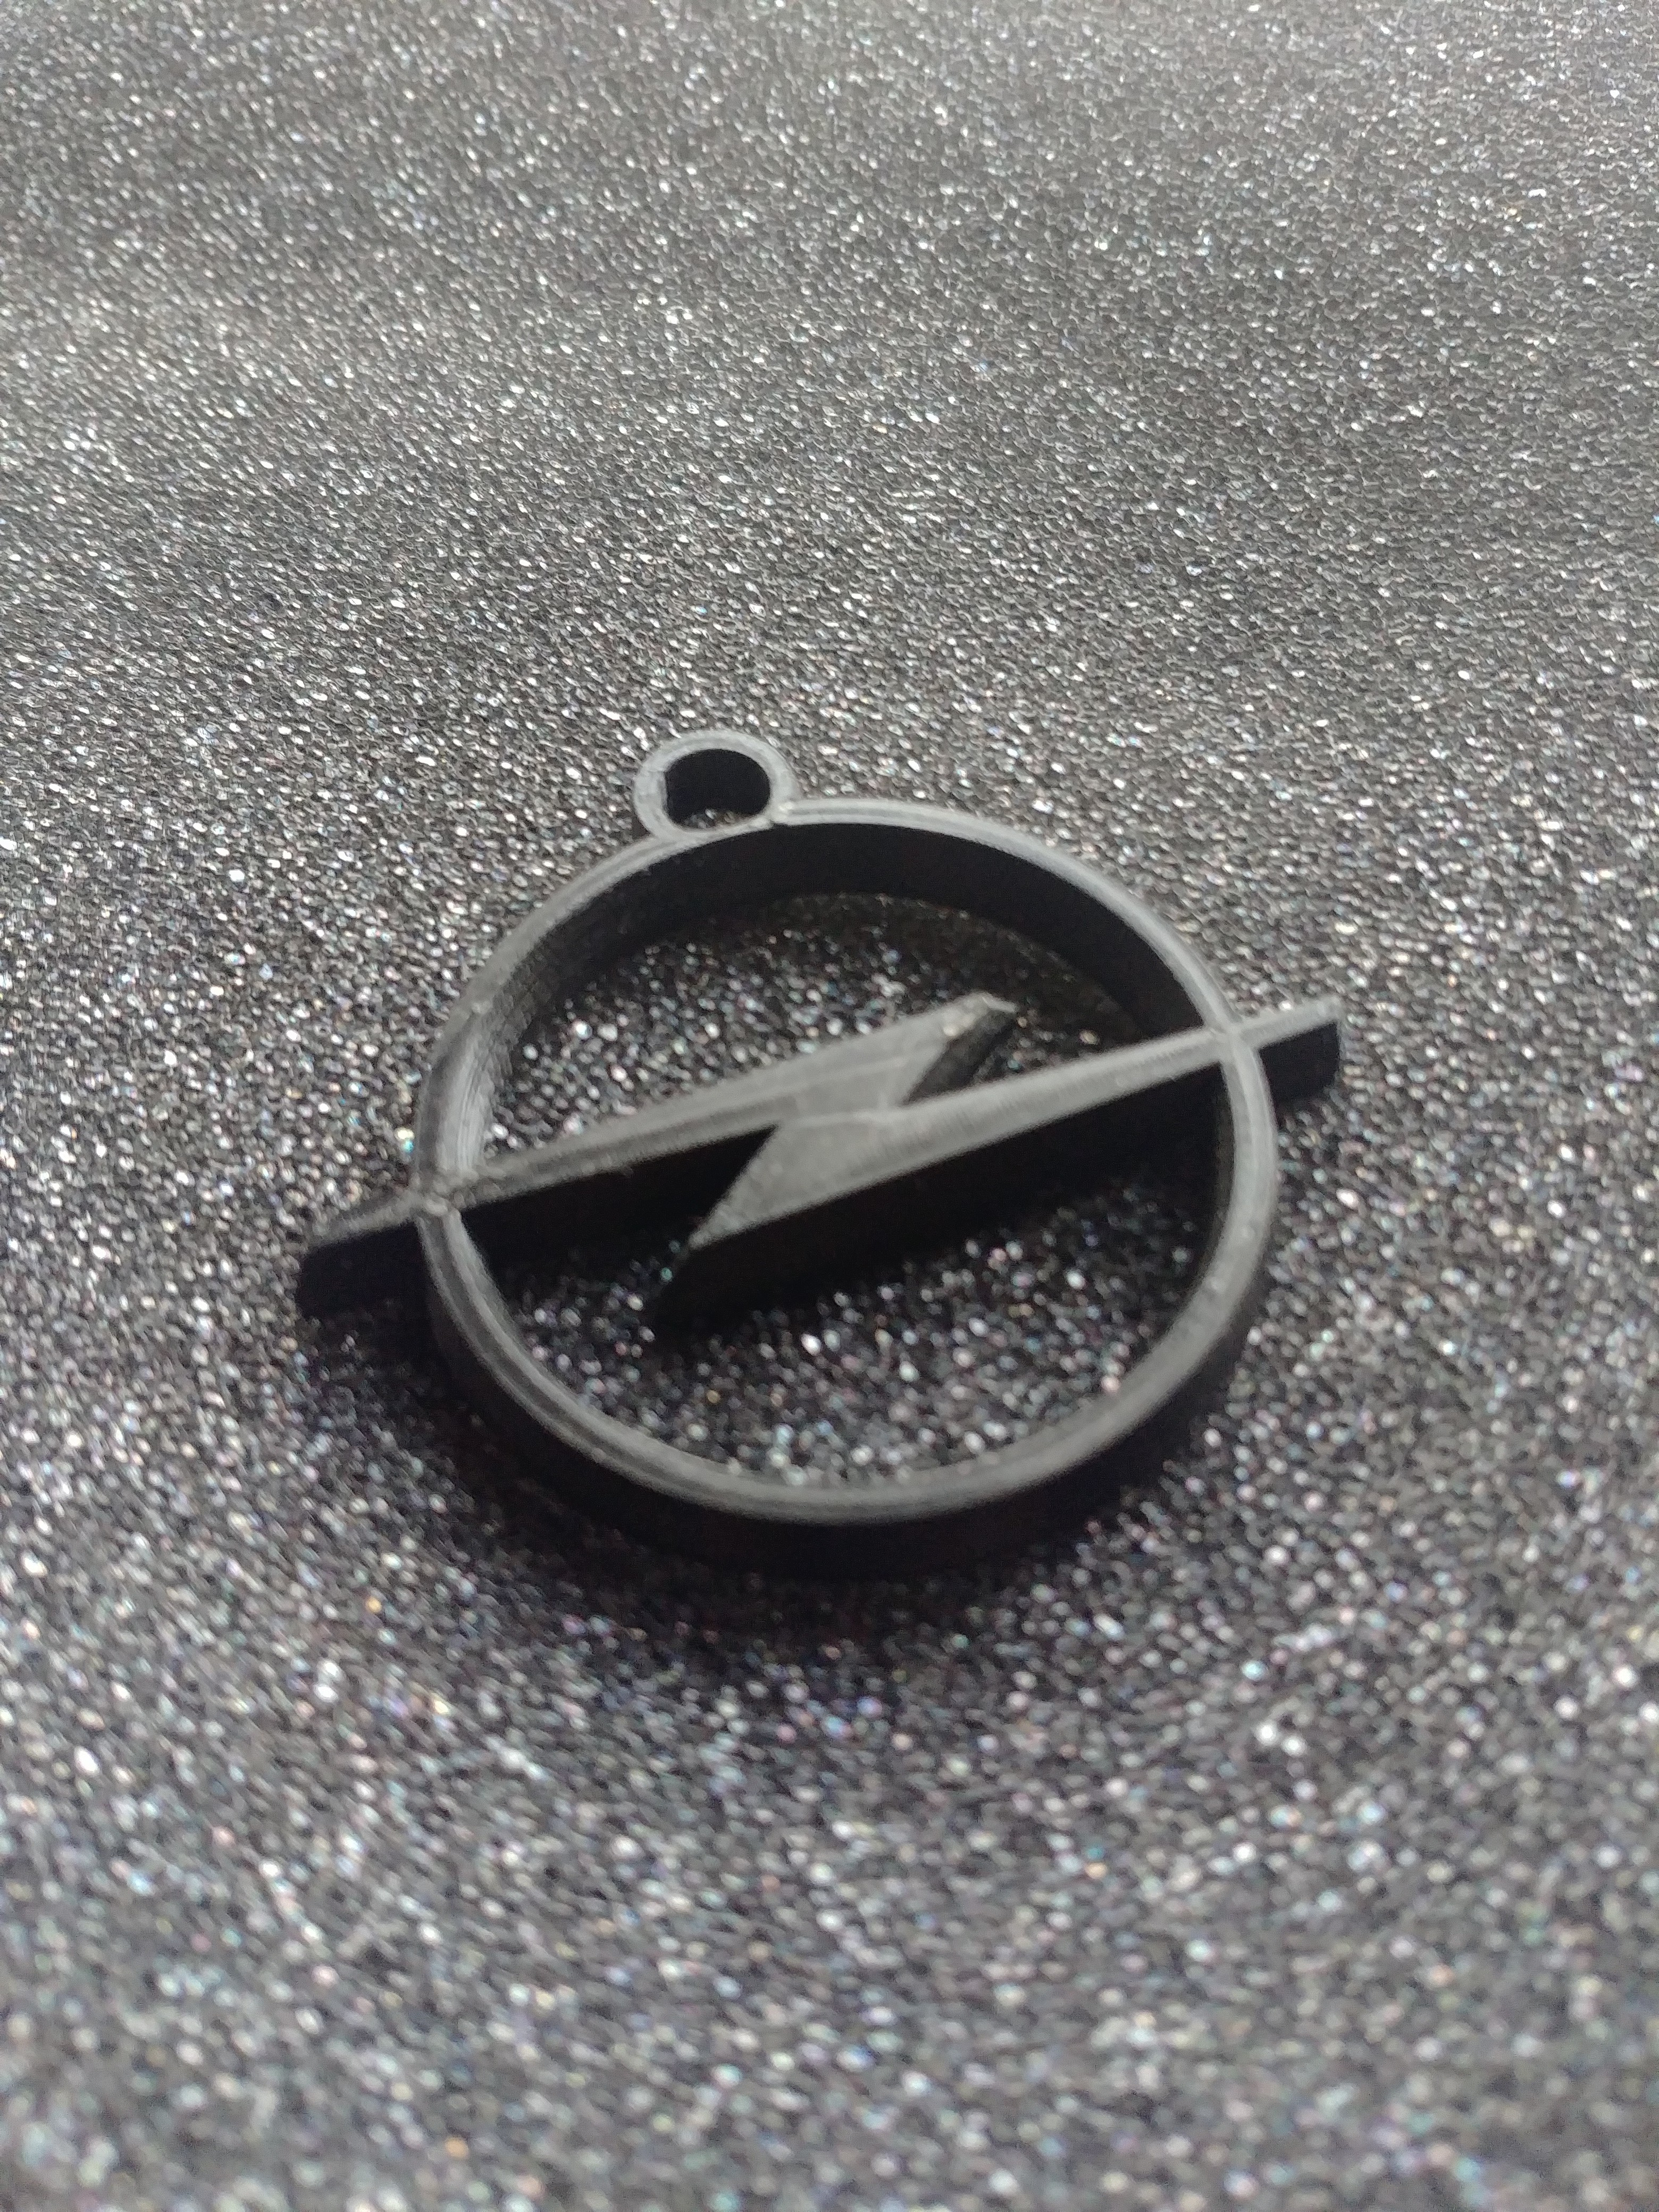 20180703_091831.jpg Download STL file Opel key ring • 3D print design, LnZProd